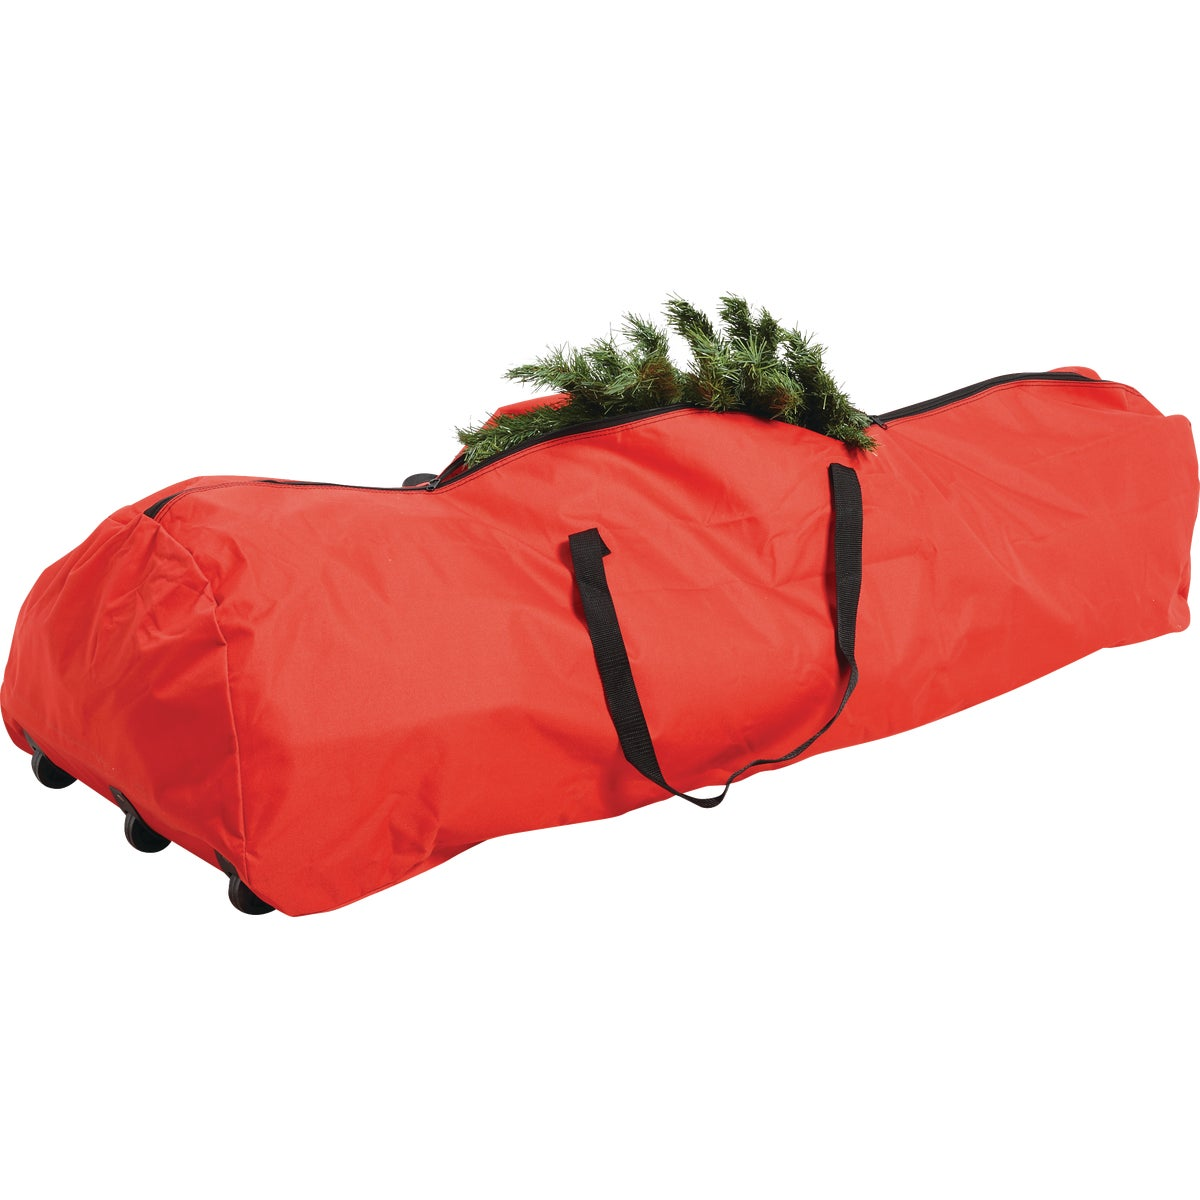 Dyno Seasonal Solutions 77000-1 Christmas Tree Bag-7.5' ROLLING TREE BAG at Sears.com